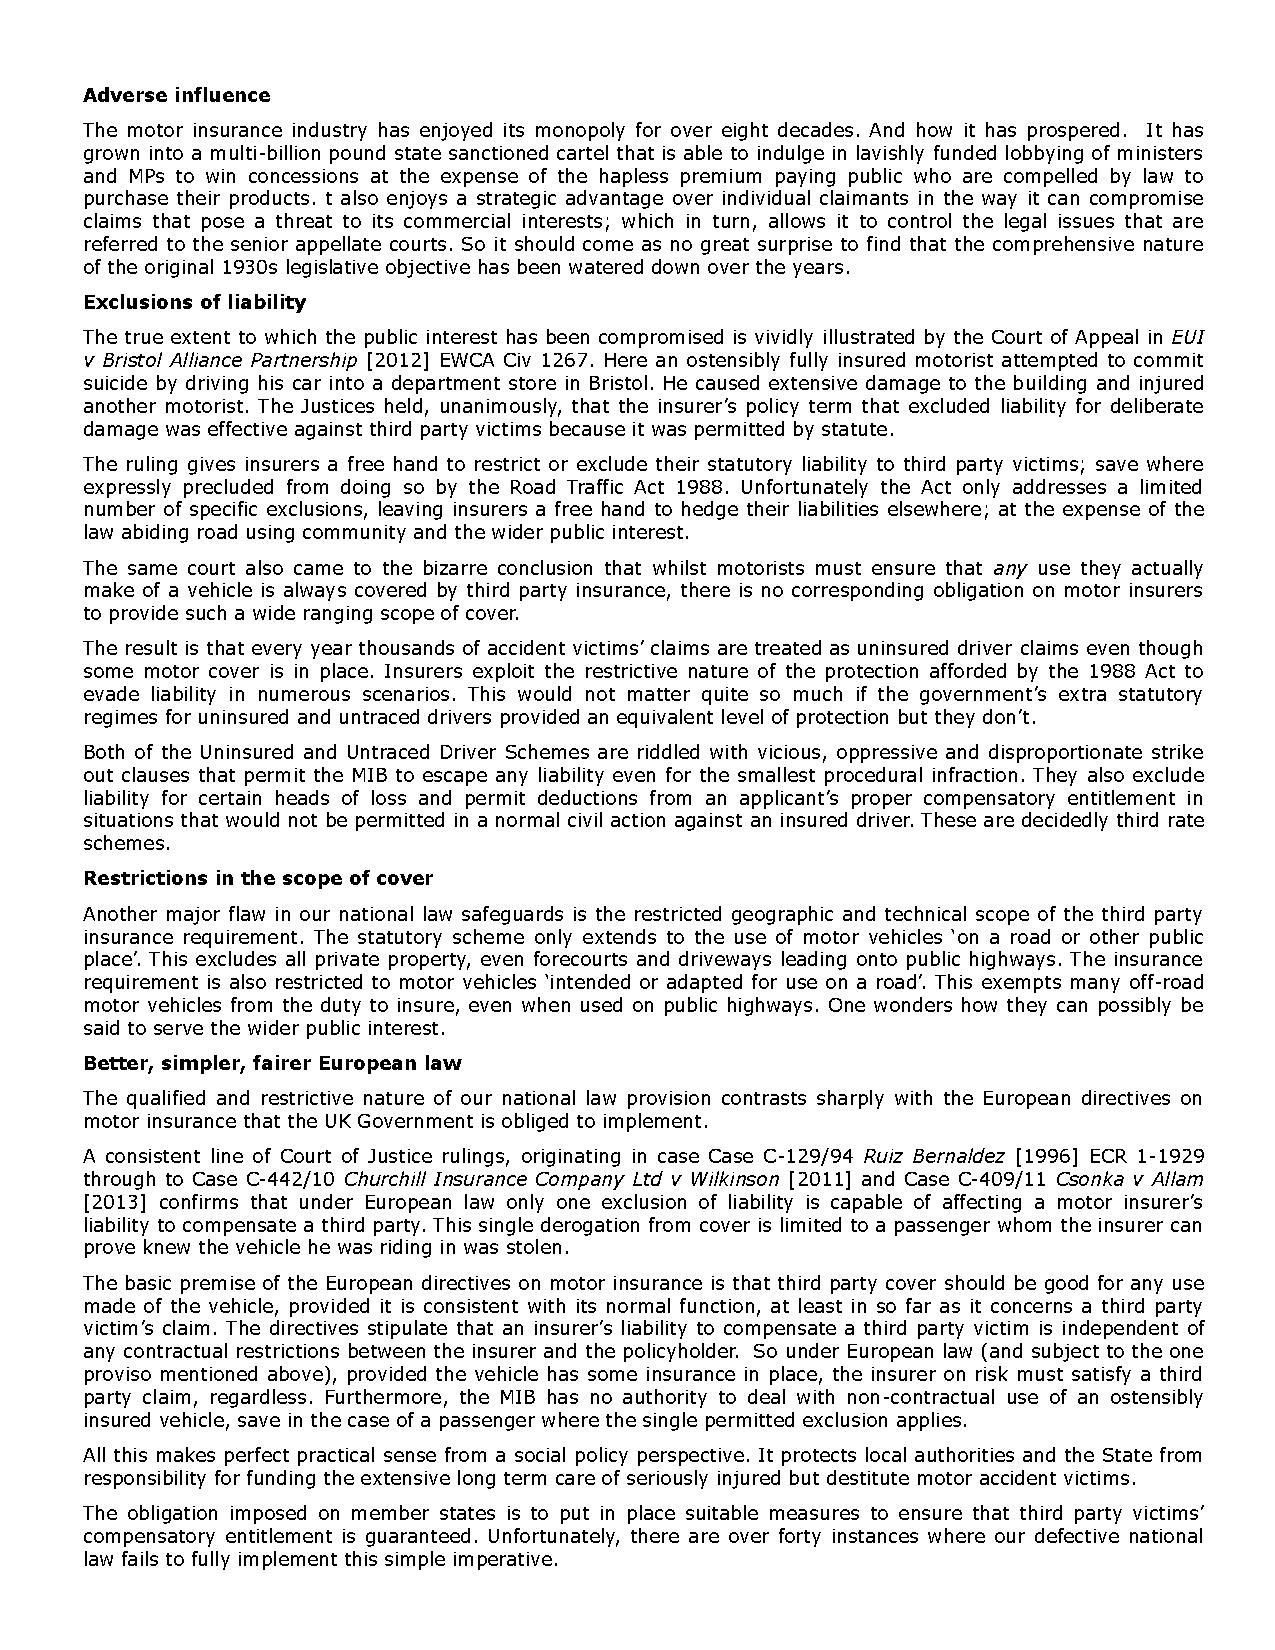 Nicholas Bevan Motor Insurance Reform Powerpoint Presentation Ppt